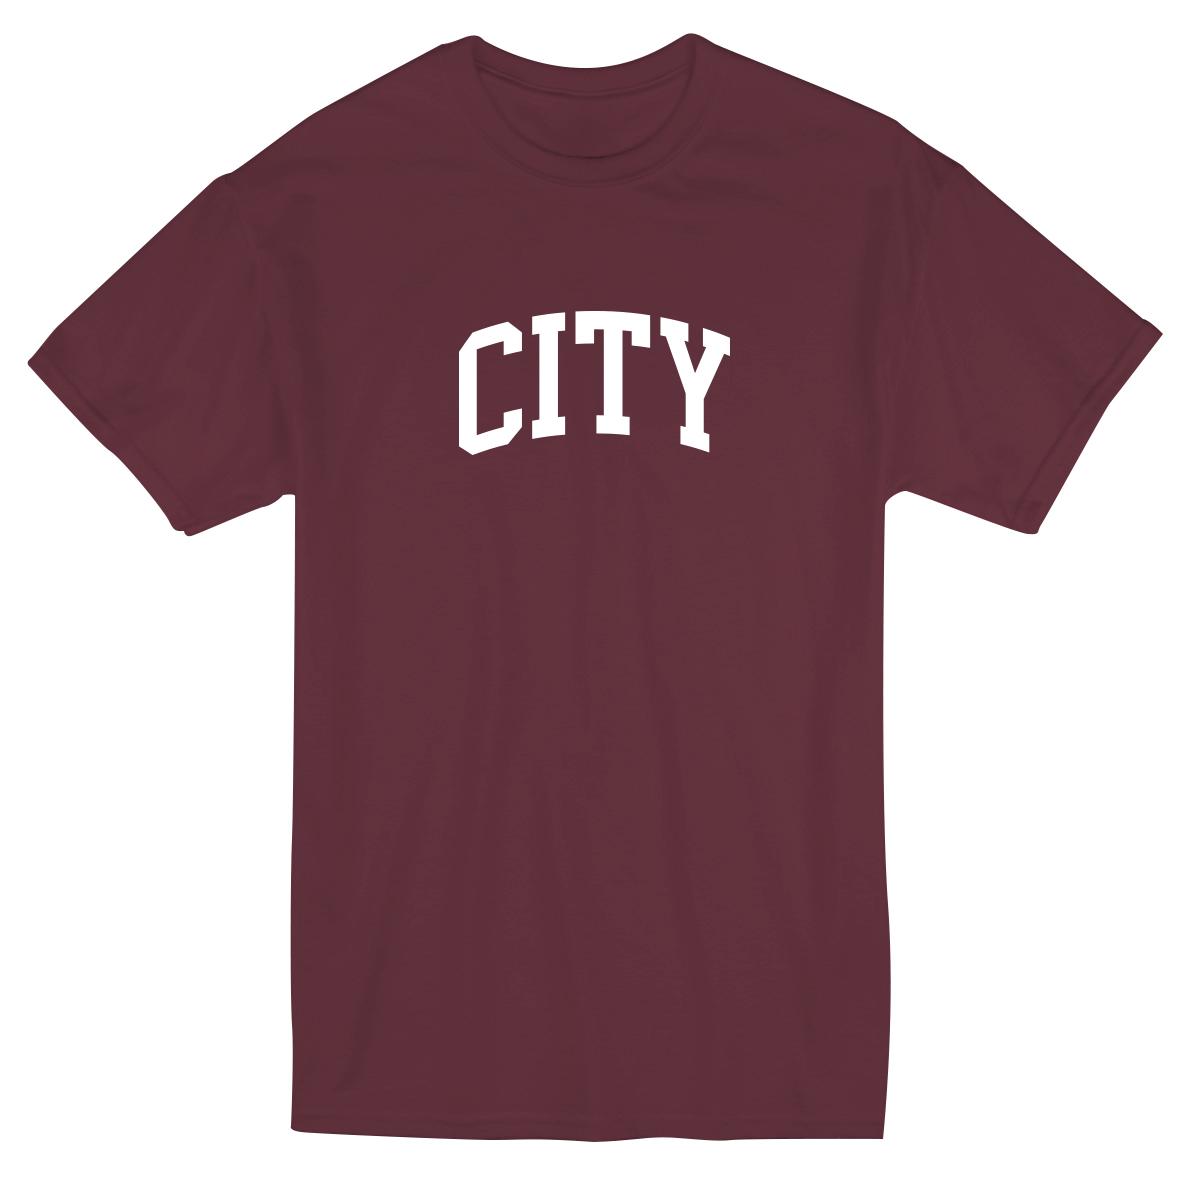 City James - City - Burgundy.jpg